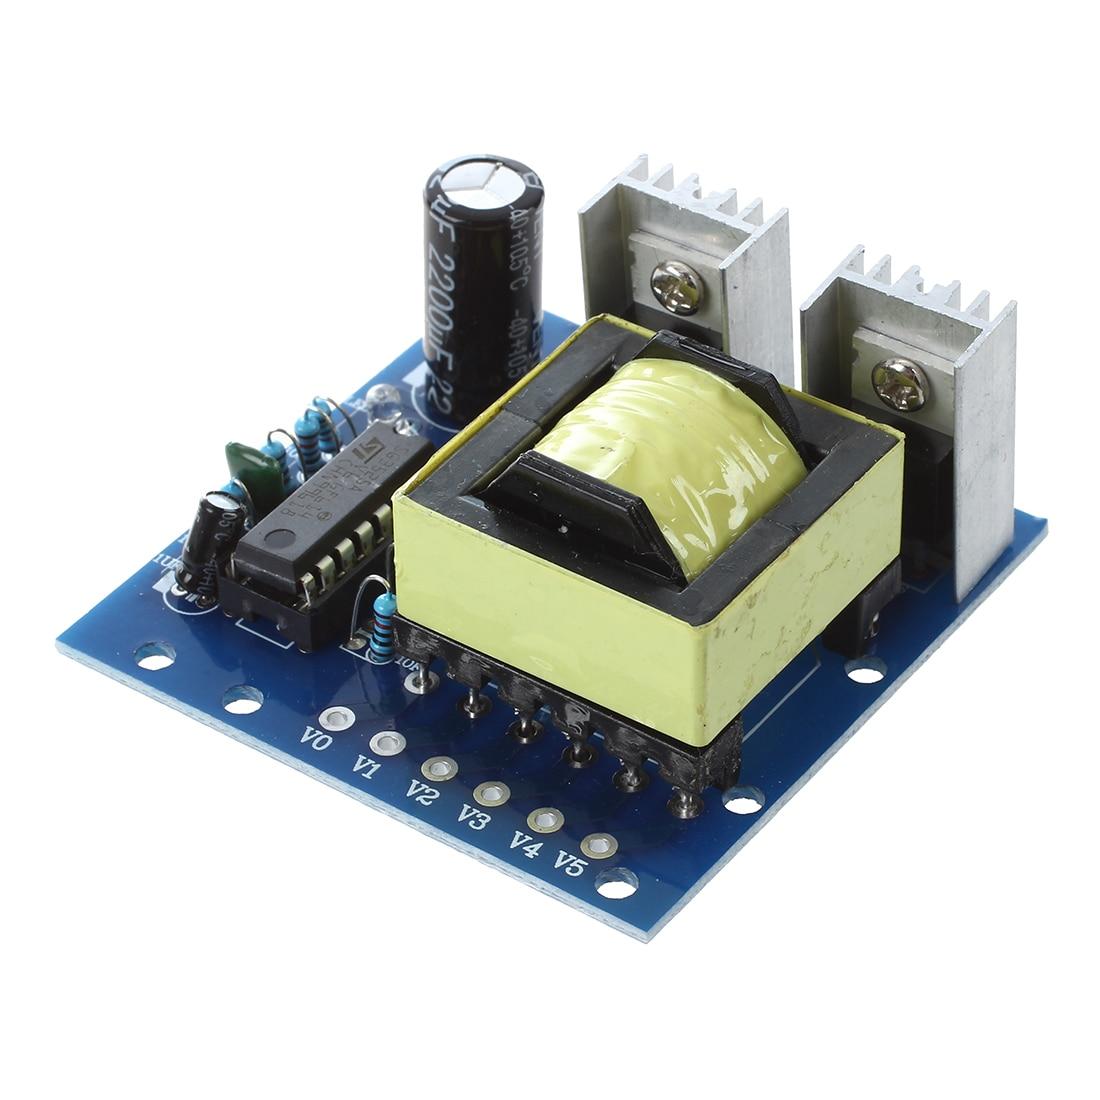 150W Mini-typ Inverter DC-AC Batterie DC 12V Zu AC 220V Steigern Power Converter